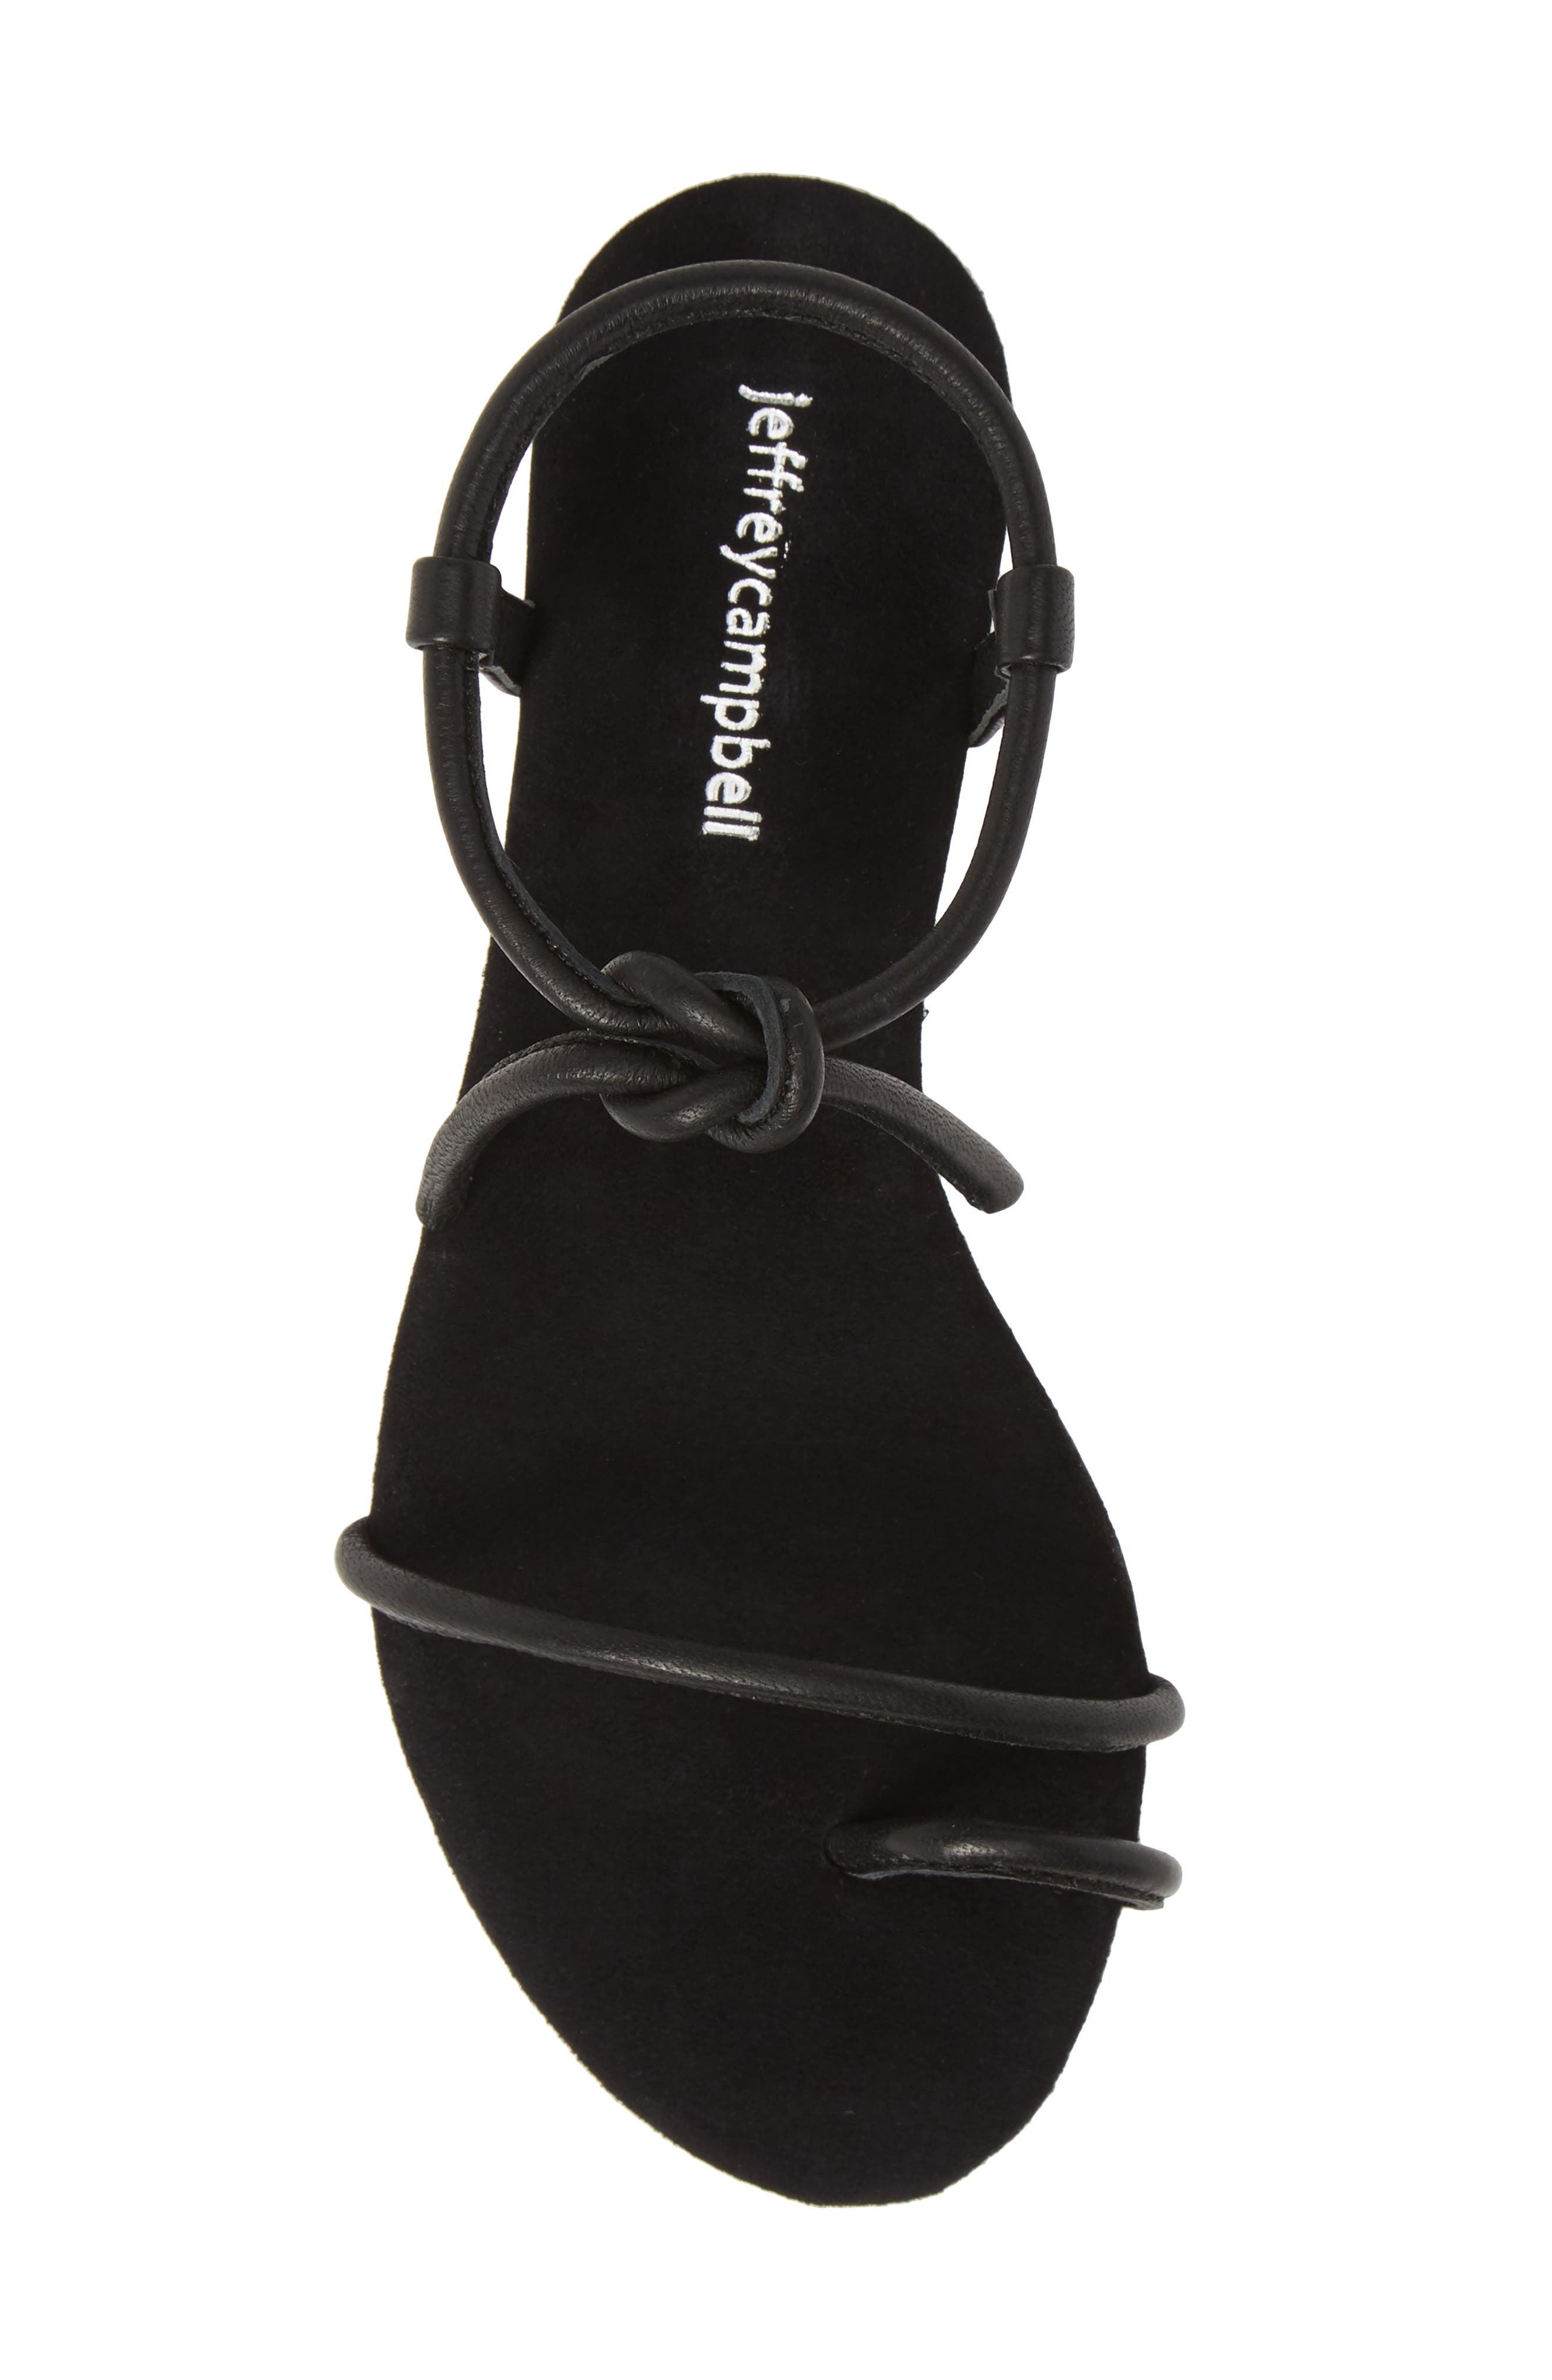 JEFFREY CAMPBELL, Aster Tie Sandal, Alternate thumbnail 5, color, BLACK LEATHER